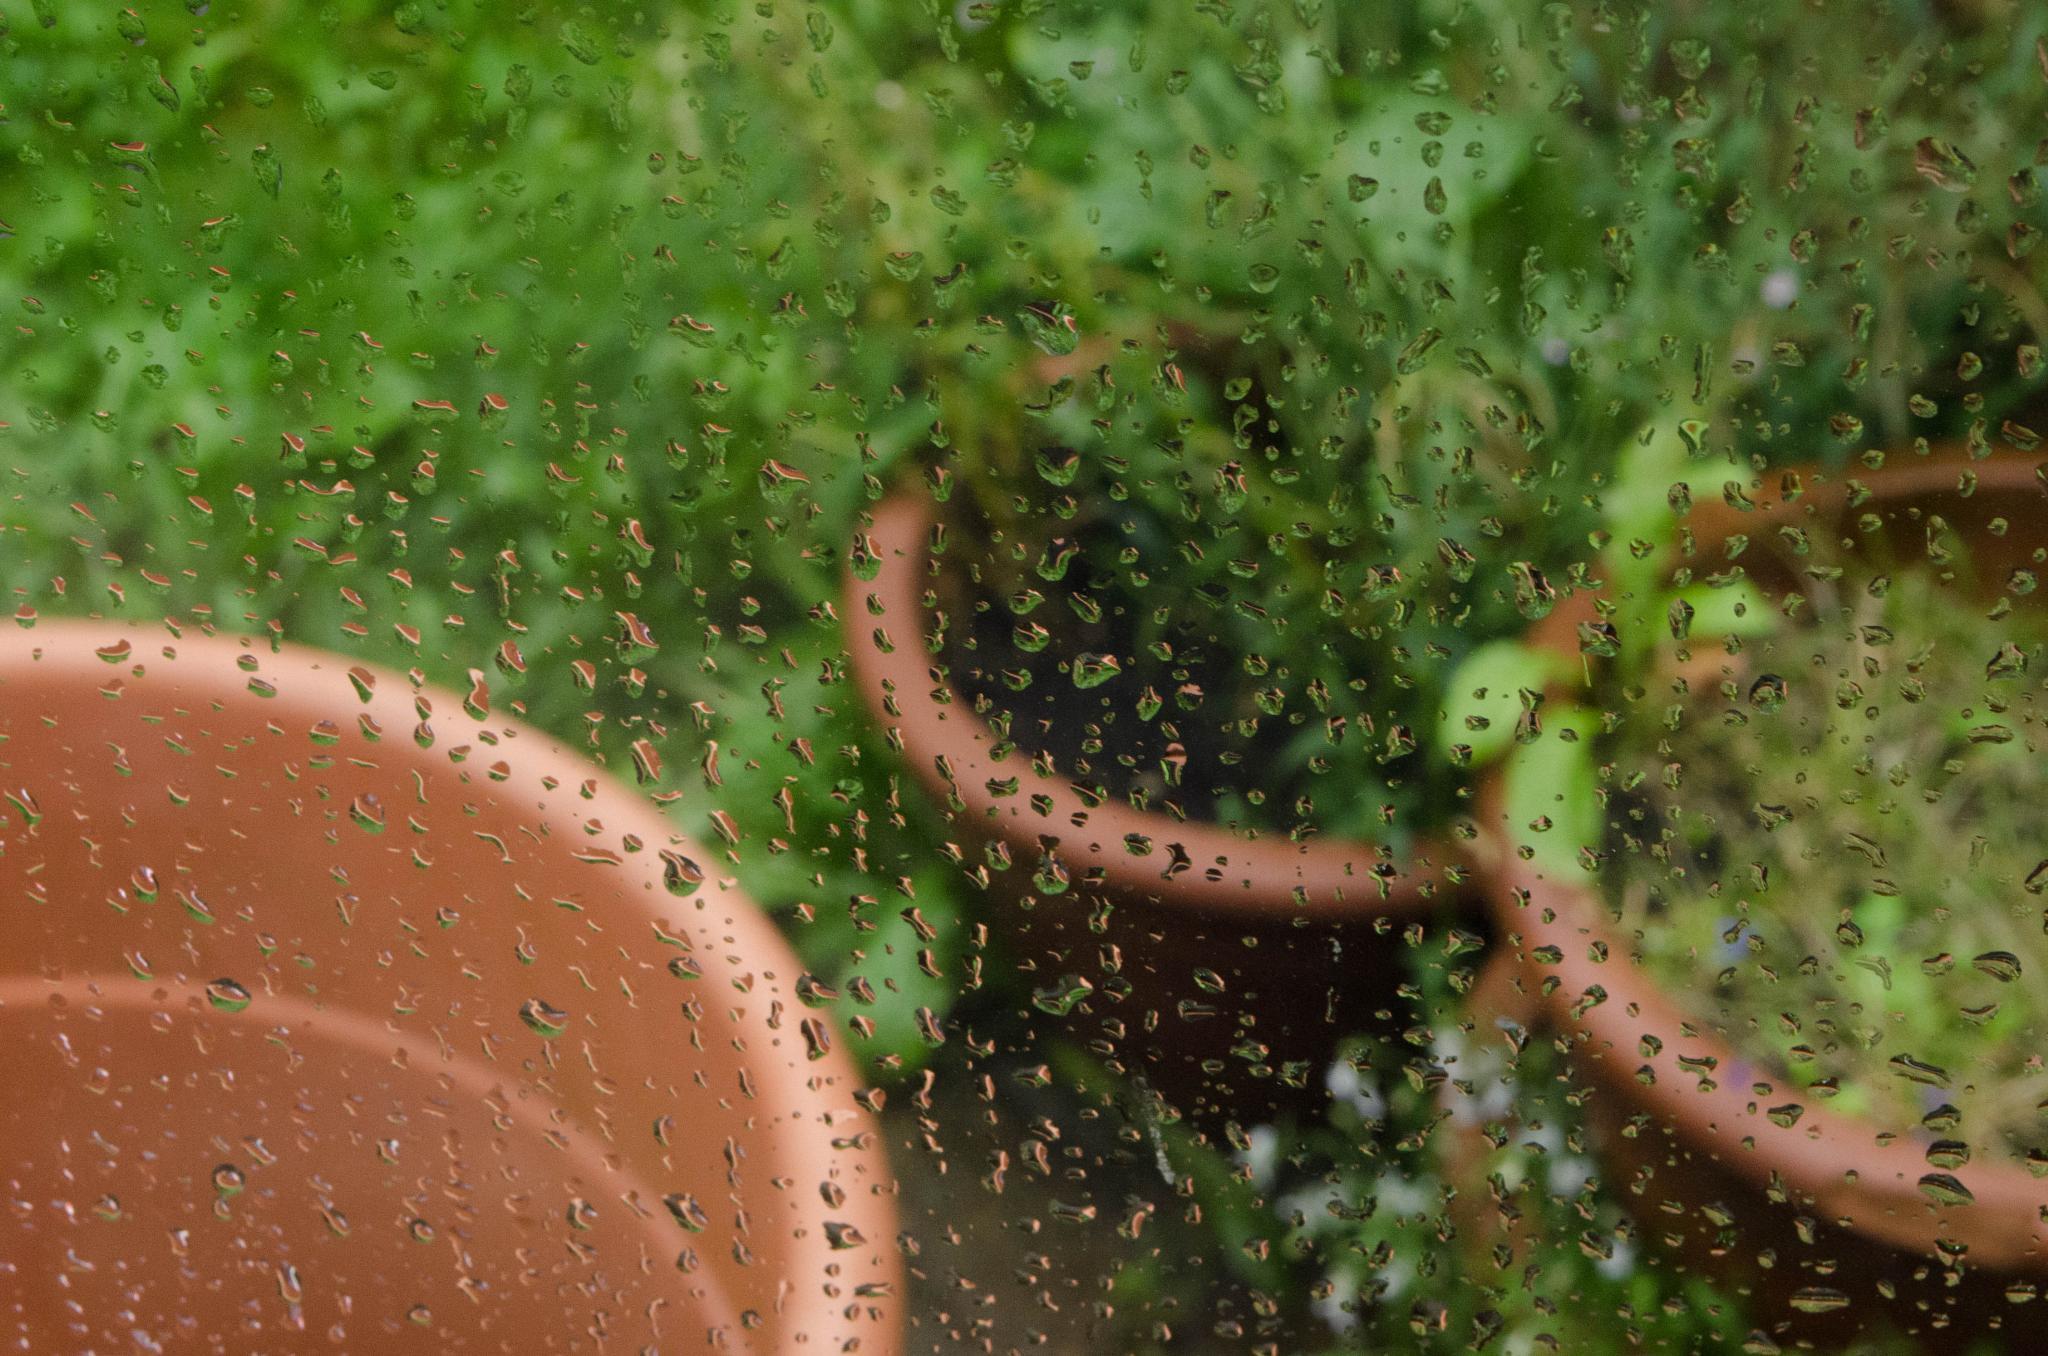 Watering the Plants by Kelley Lewis